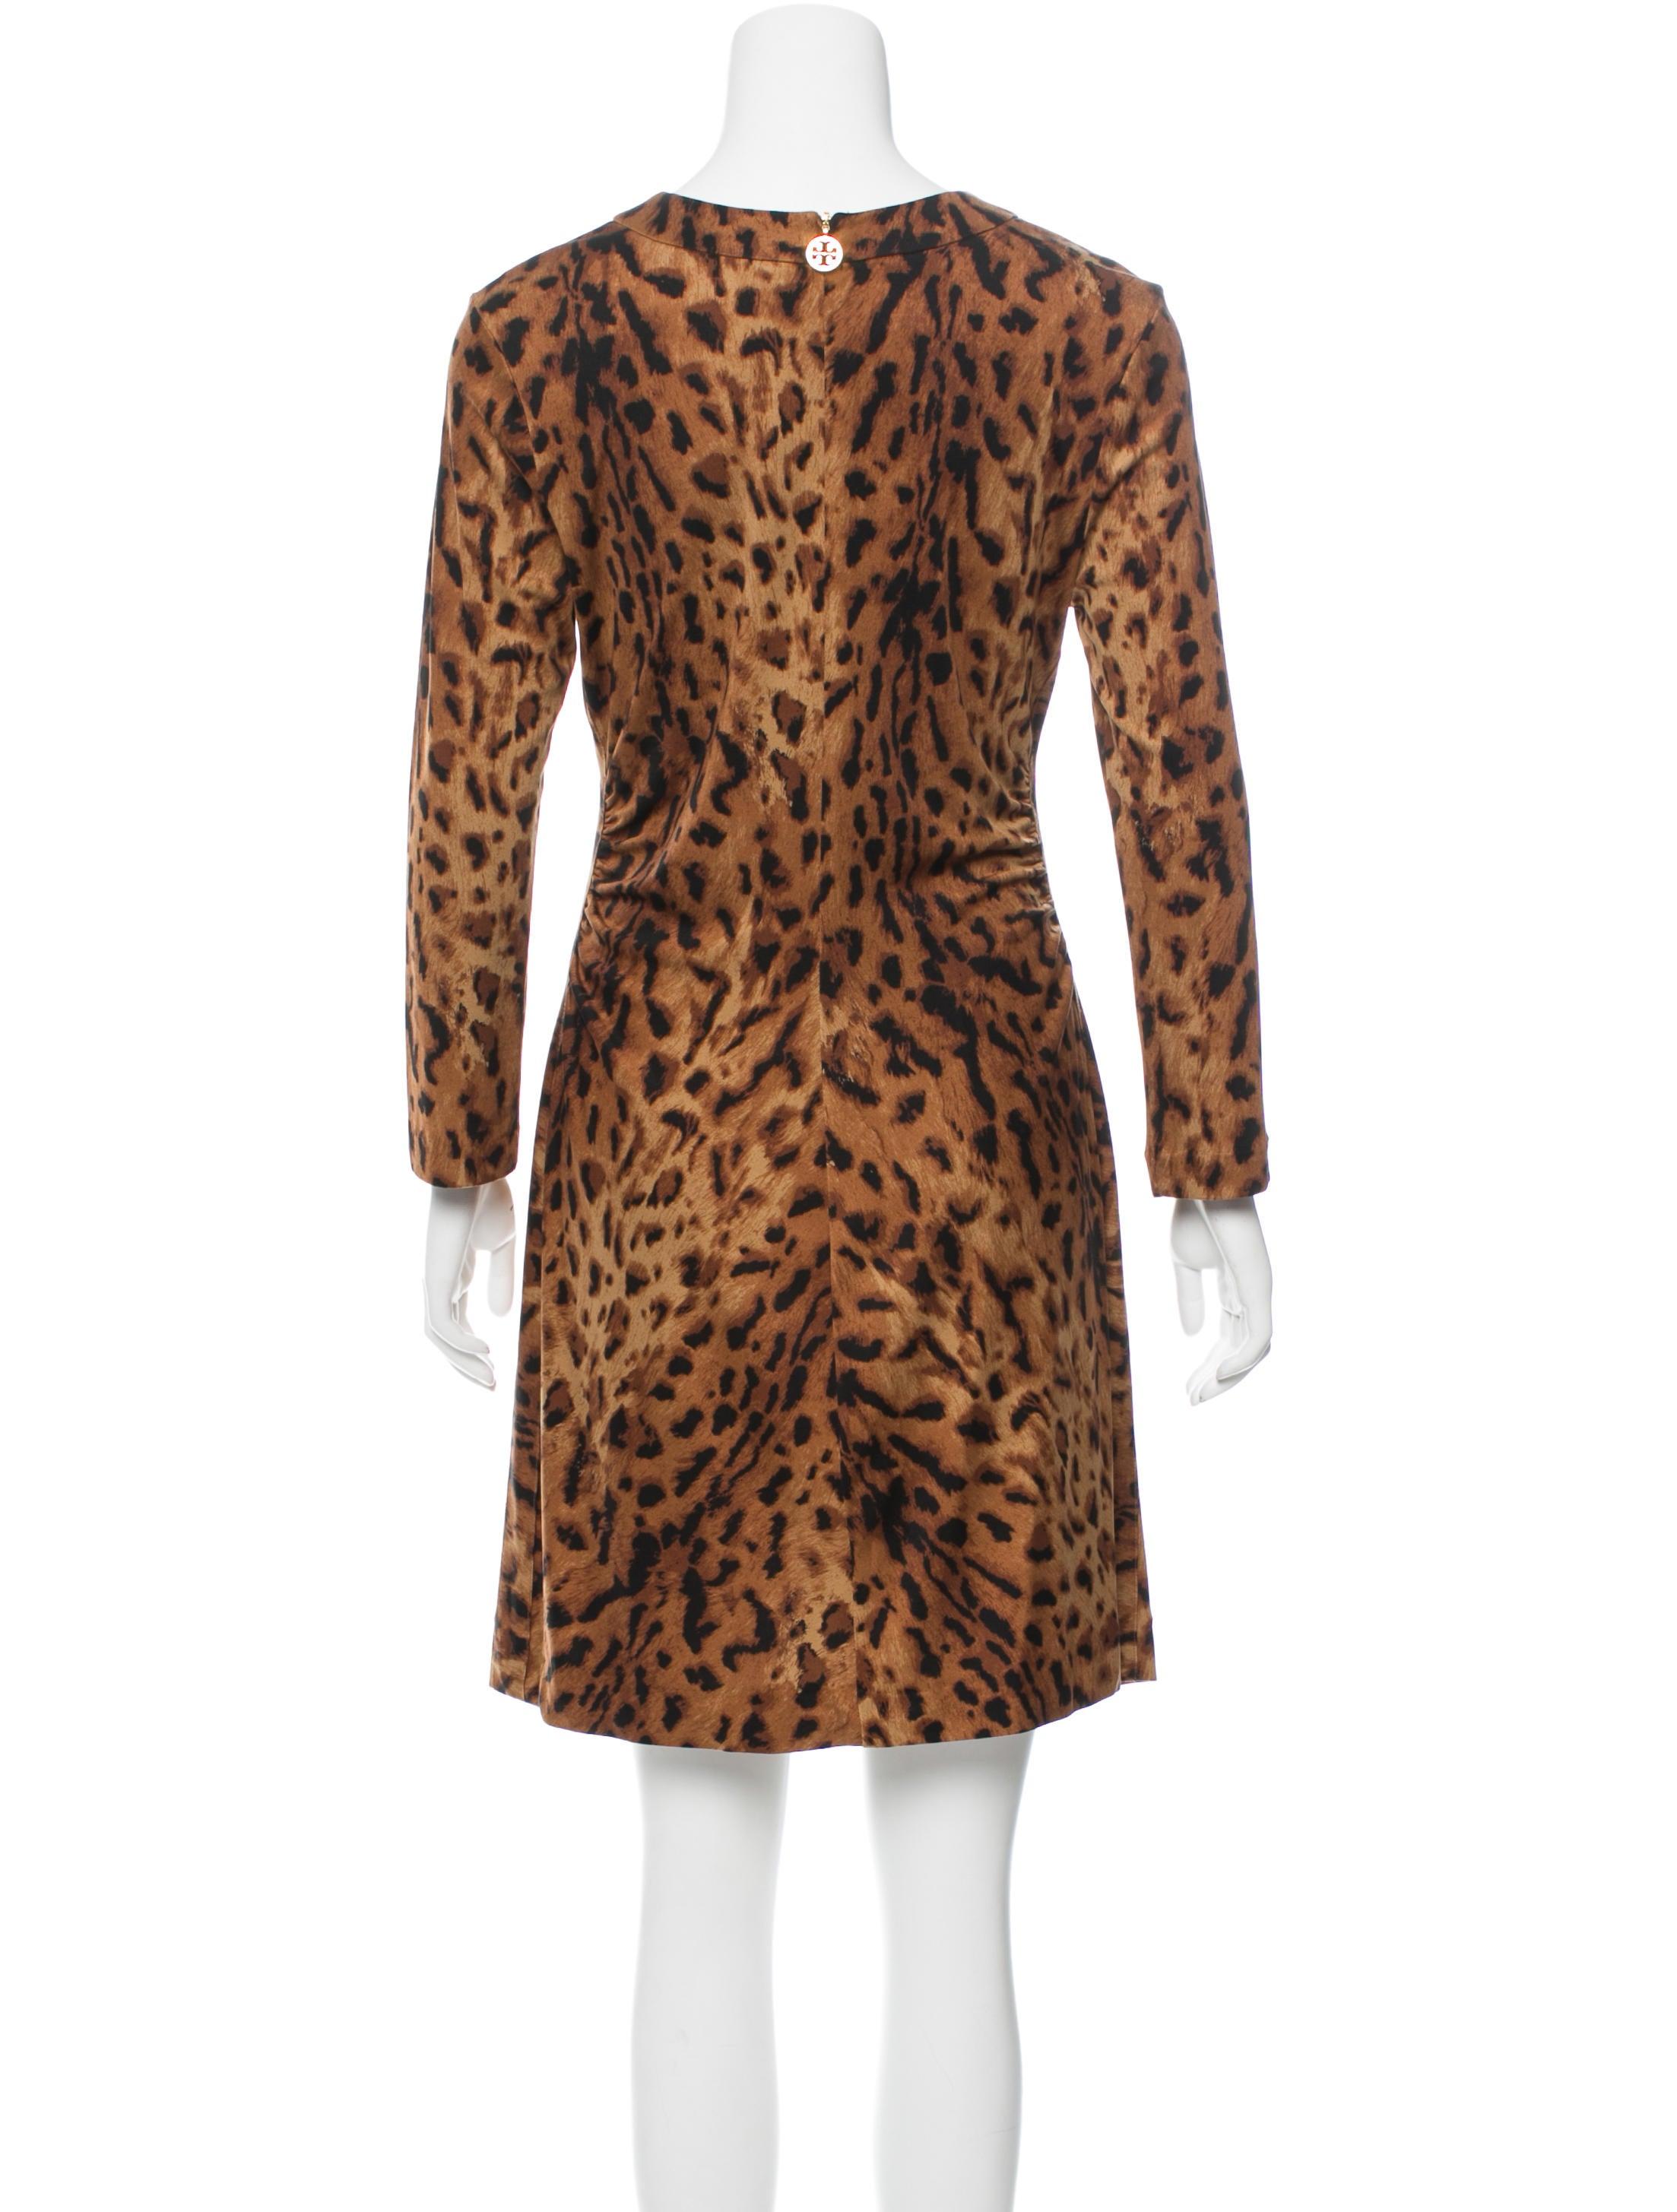 e1b0f195c401ef Tory Burch Silk Leopard Print Dress - Clothing - WTO89041